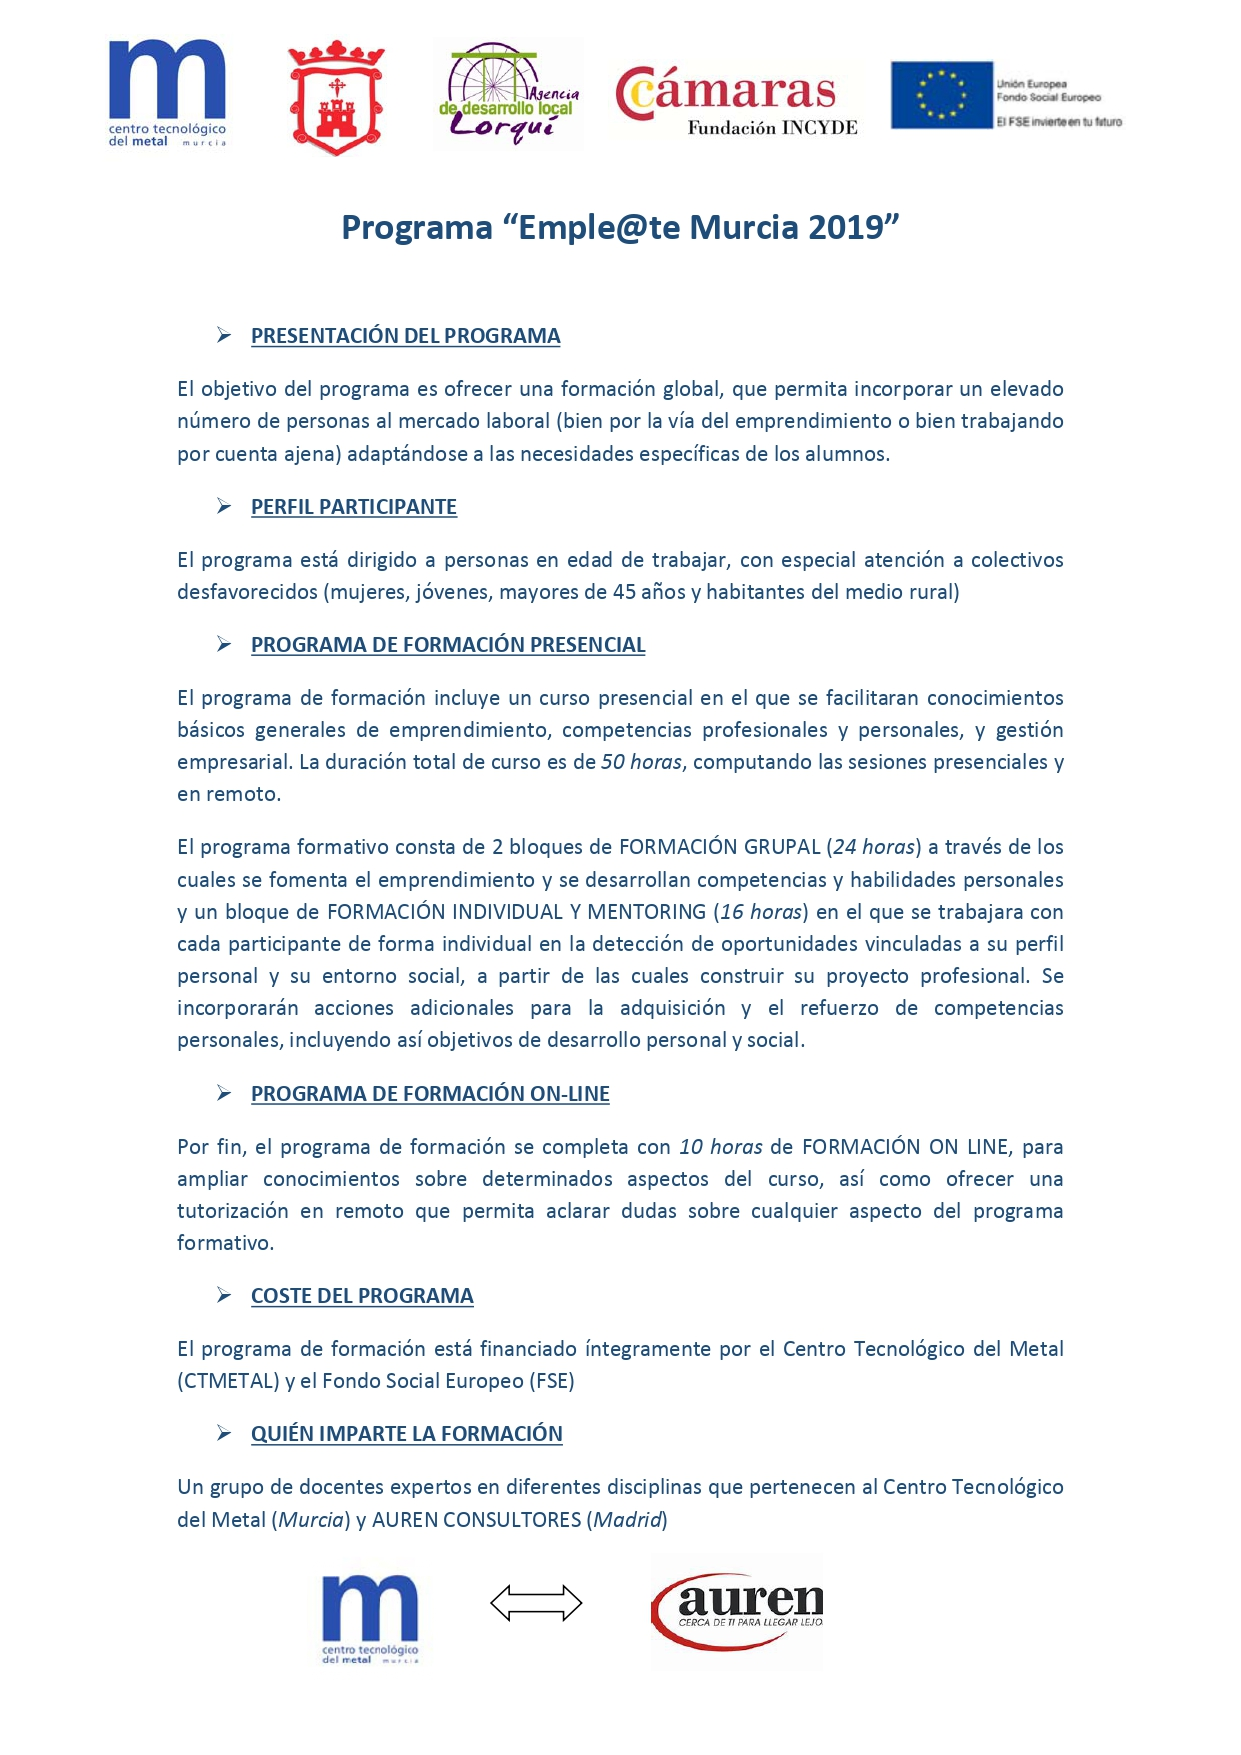 PROGRAMA  EMPLEATE MURCIA 2019_page-0001